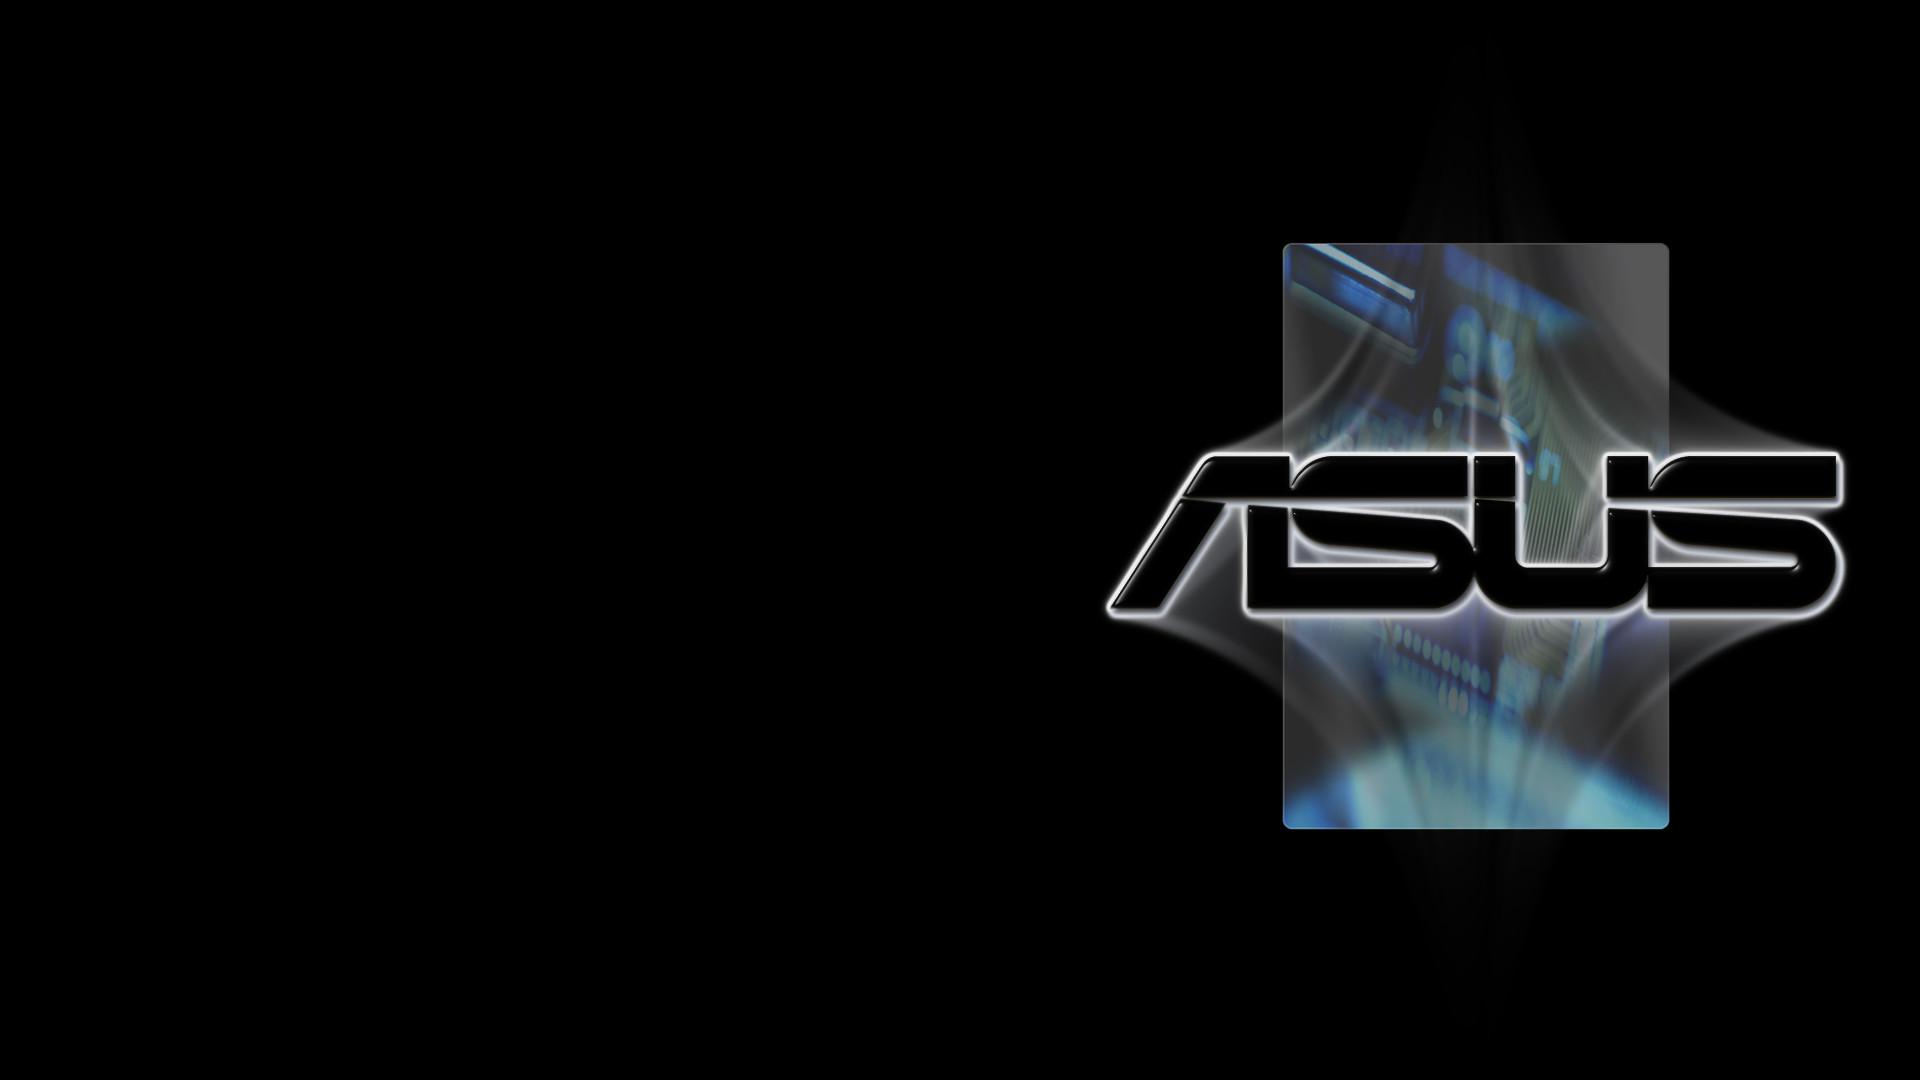 Asus HD Wallpaper 1920x1080 (86+ images)